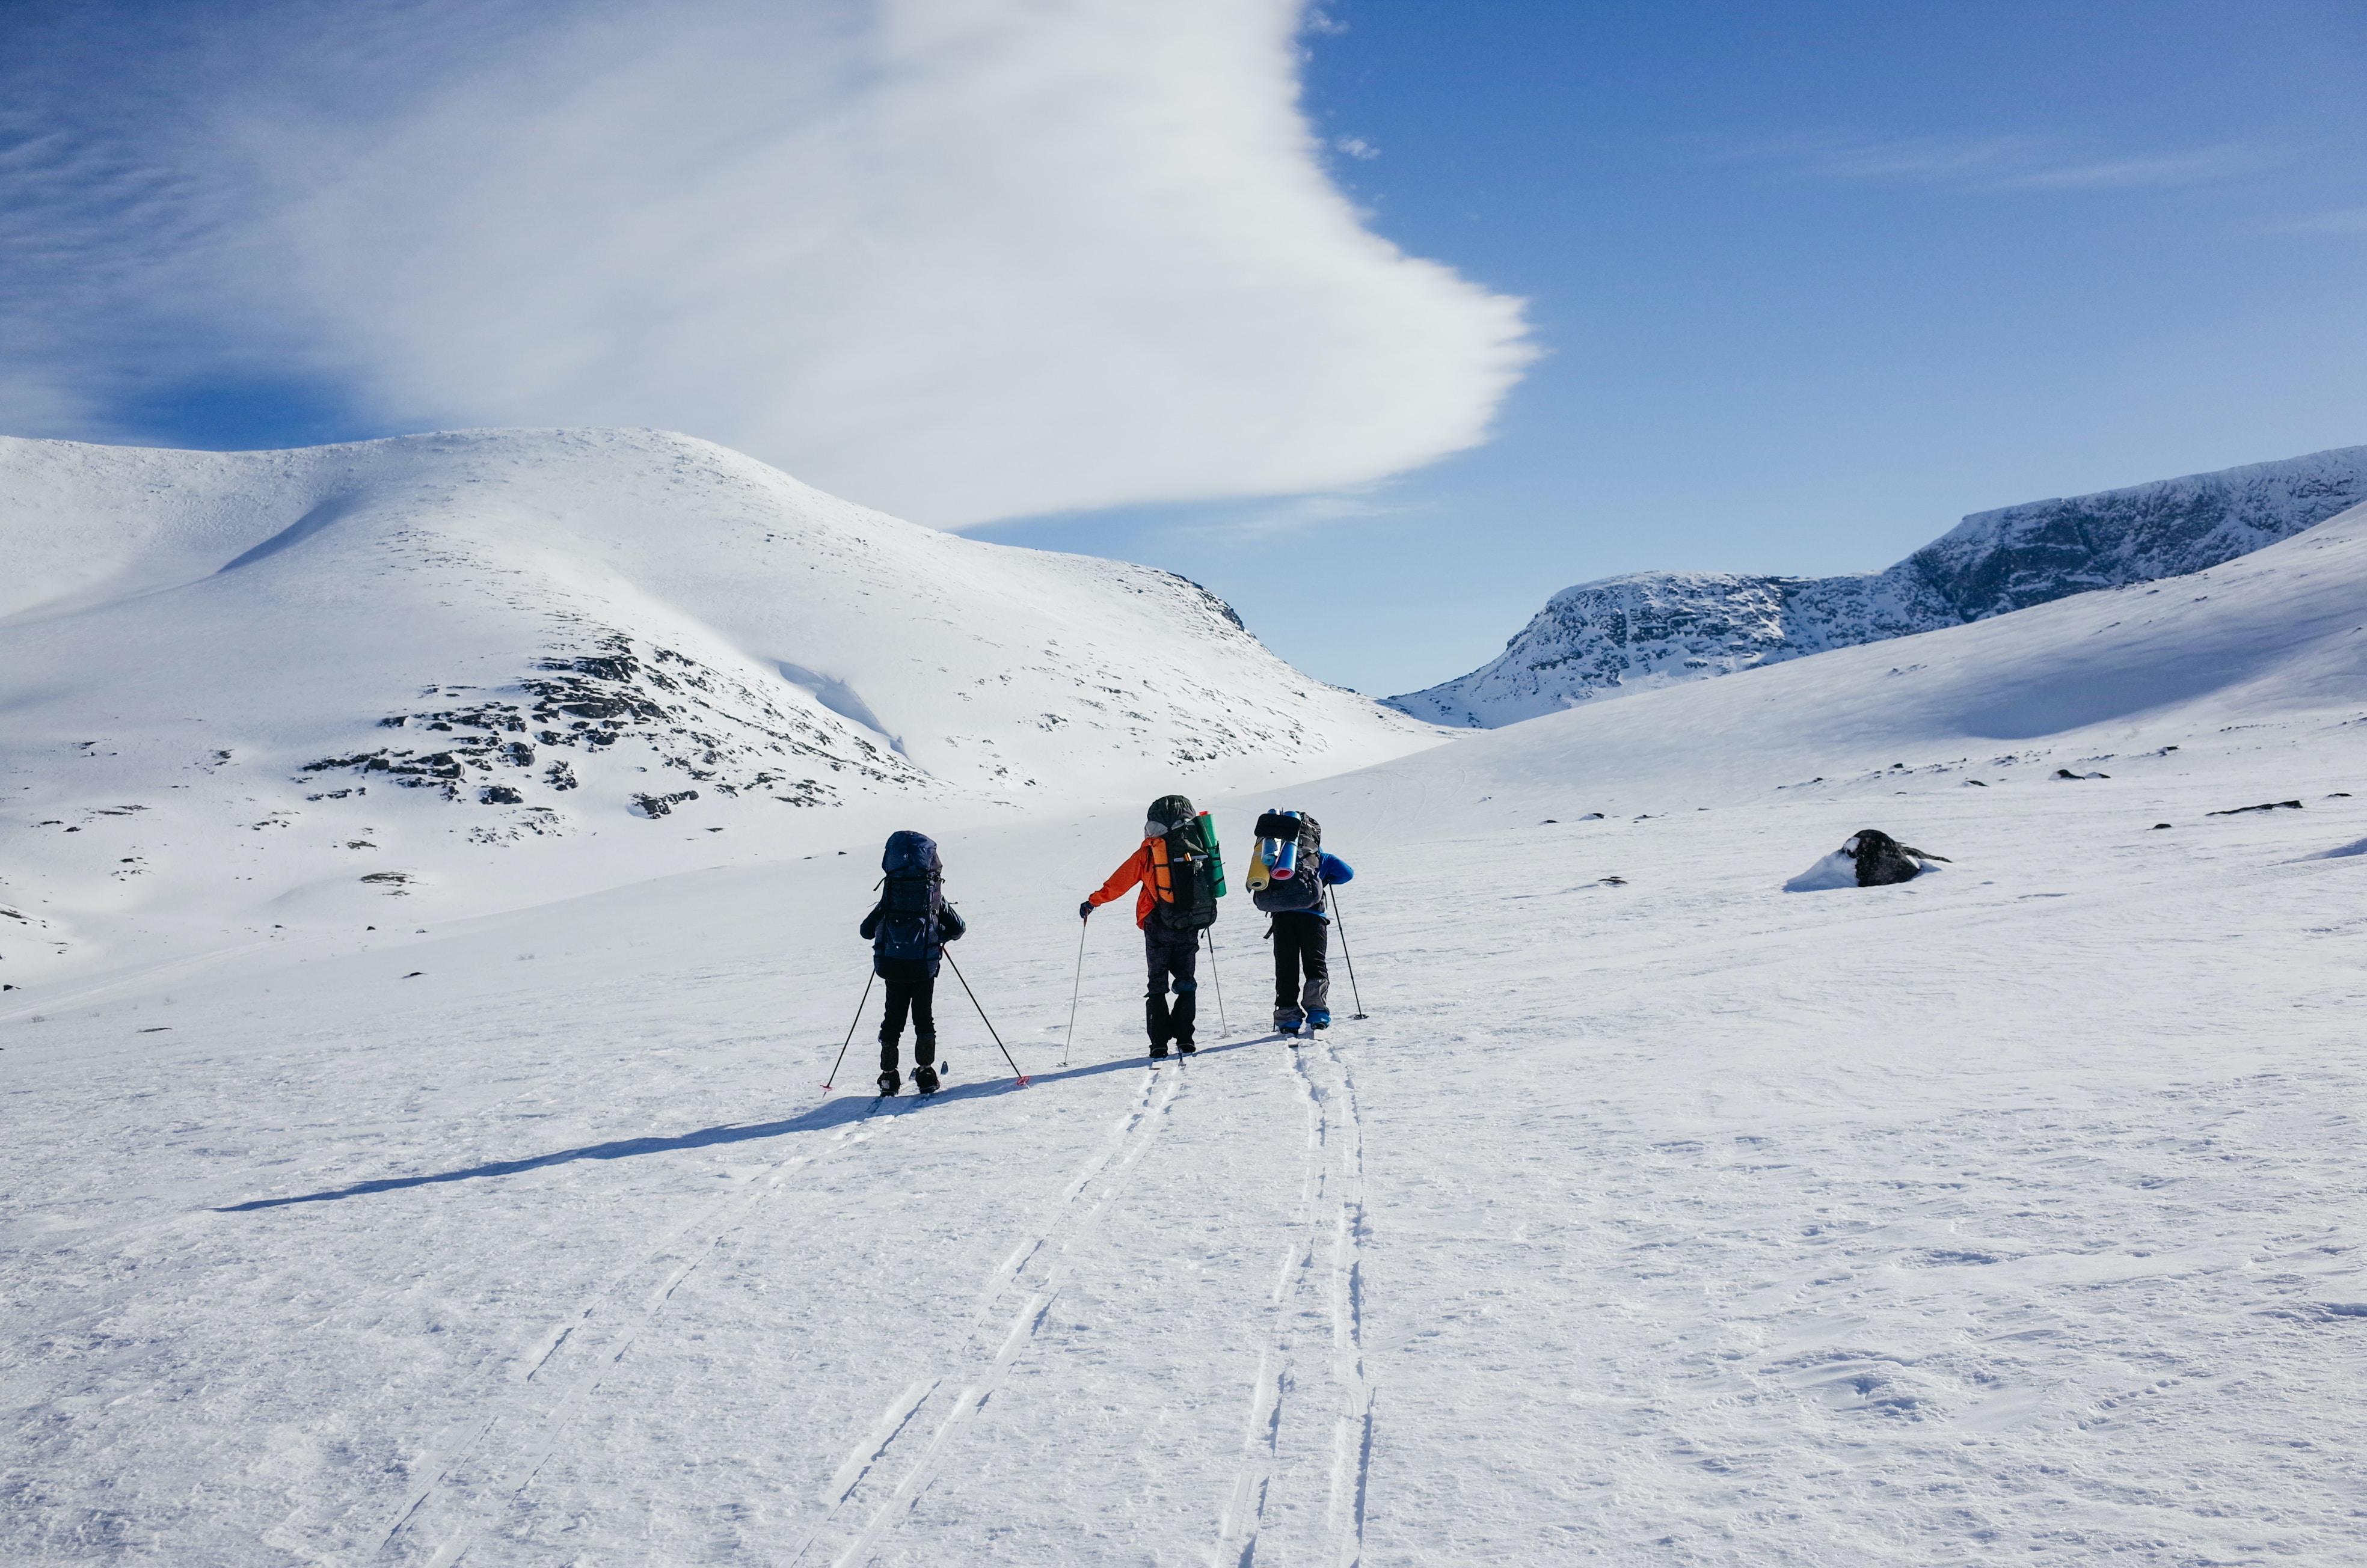 three person playing snow ski